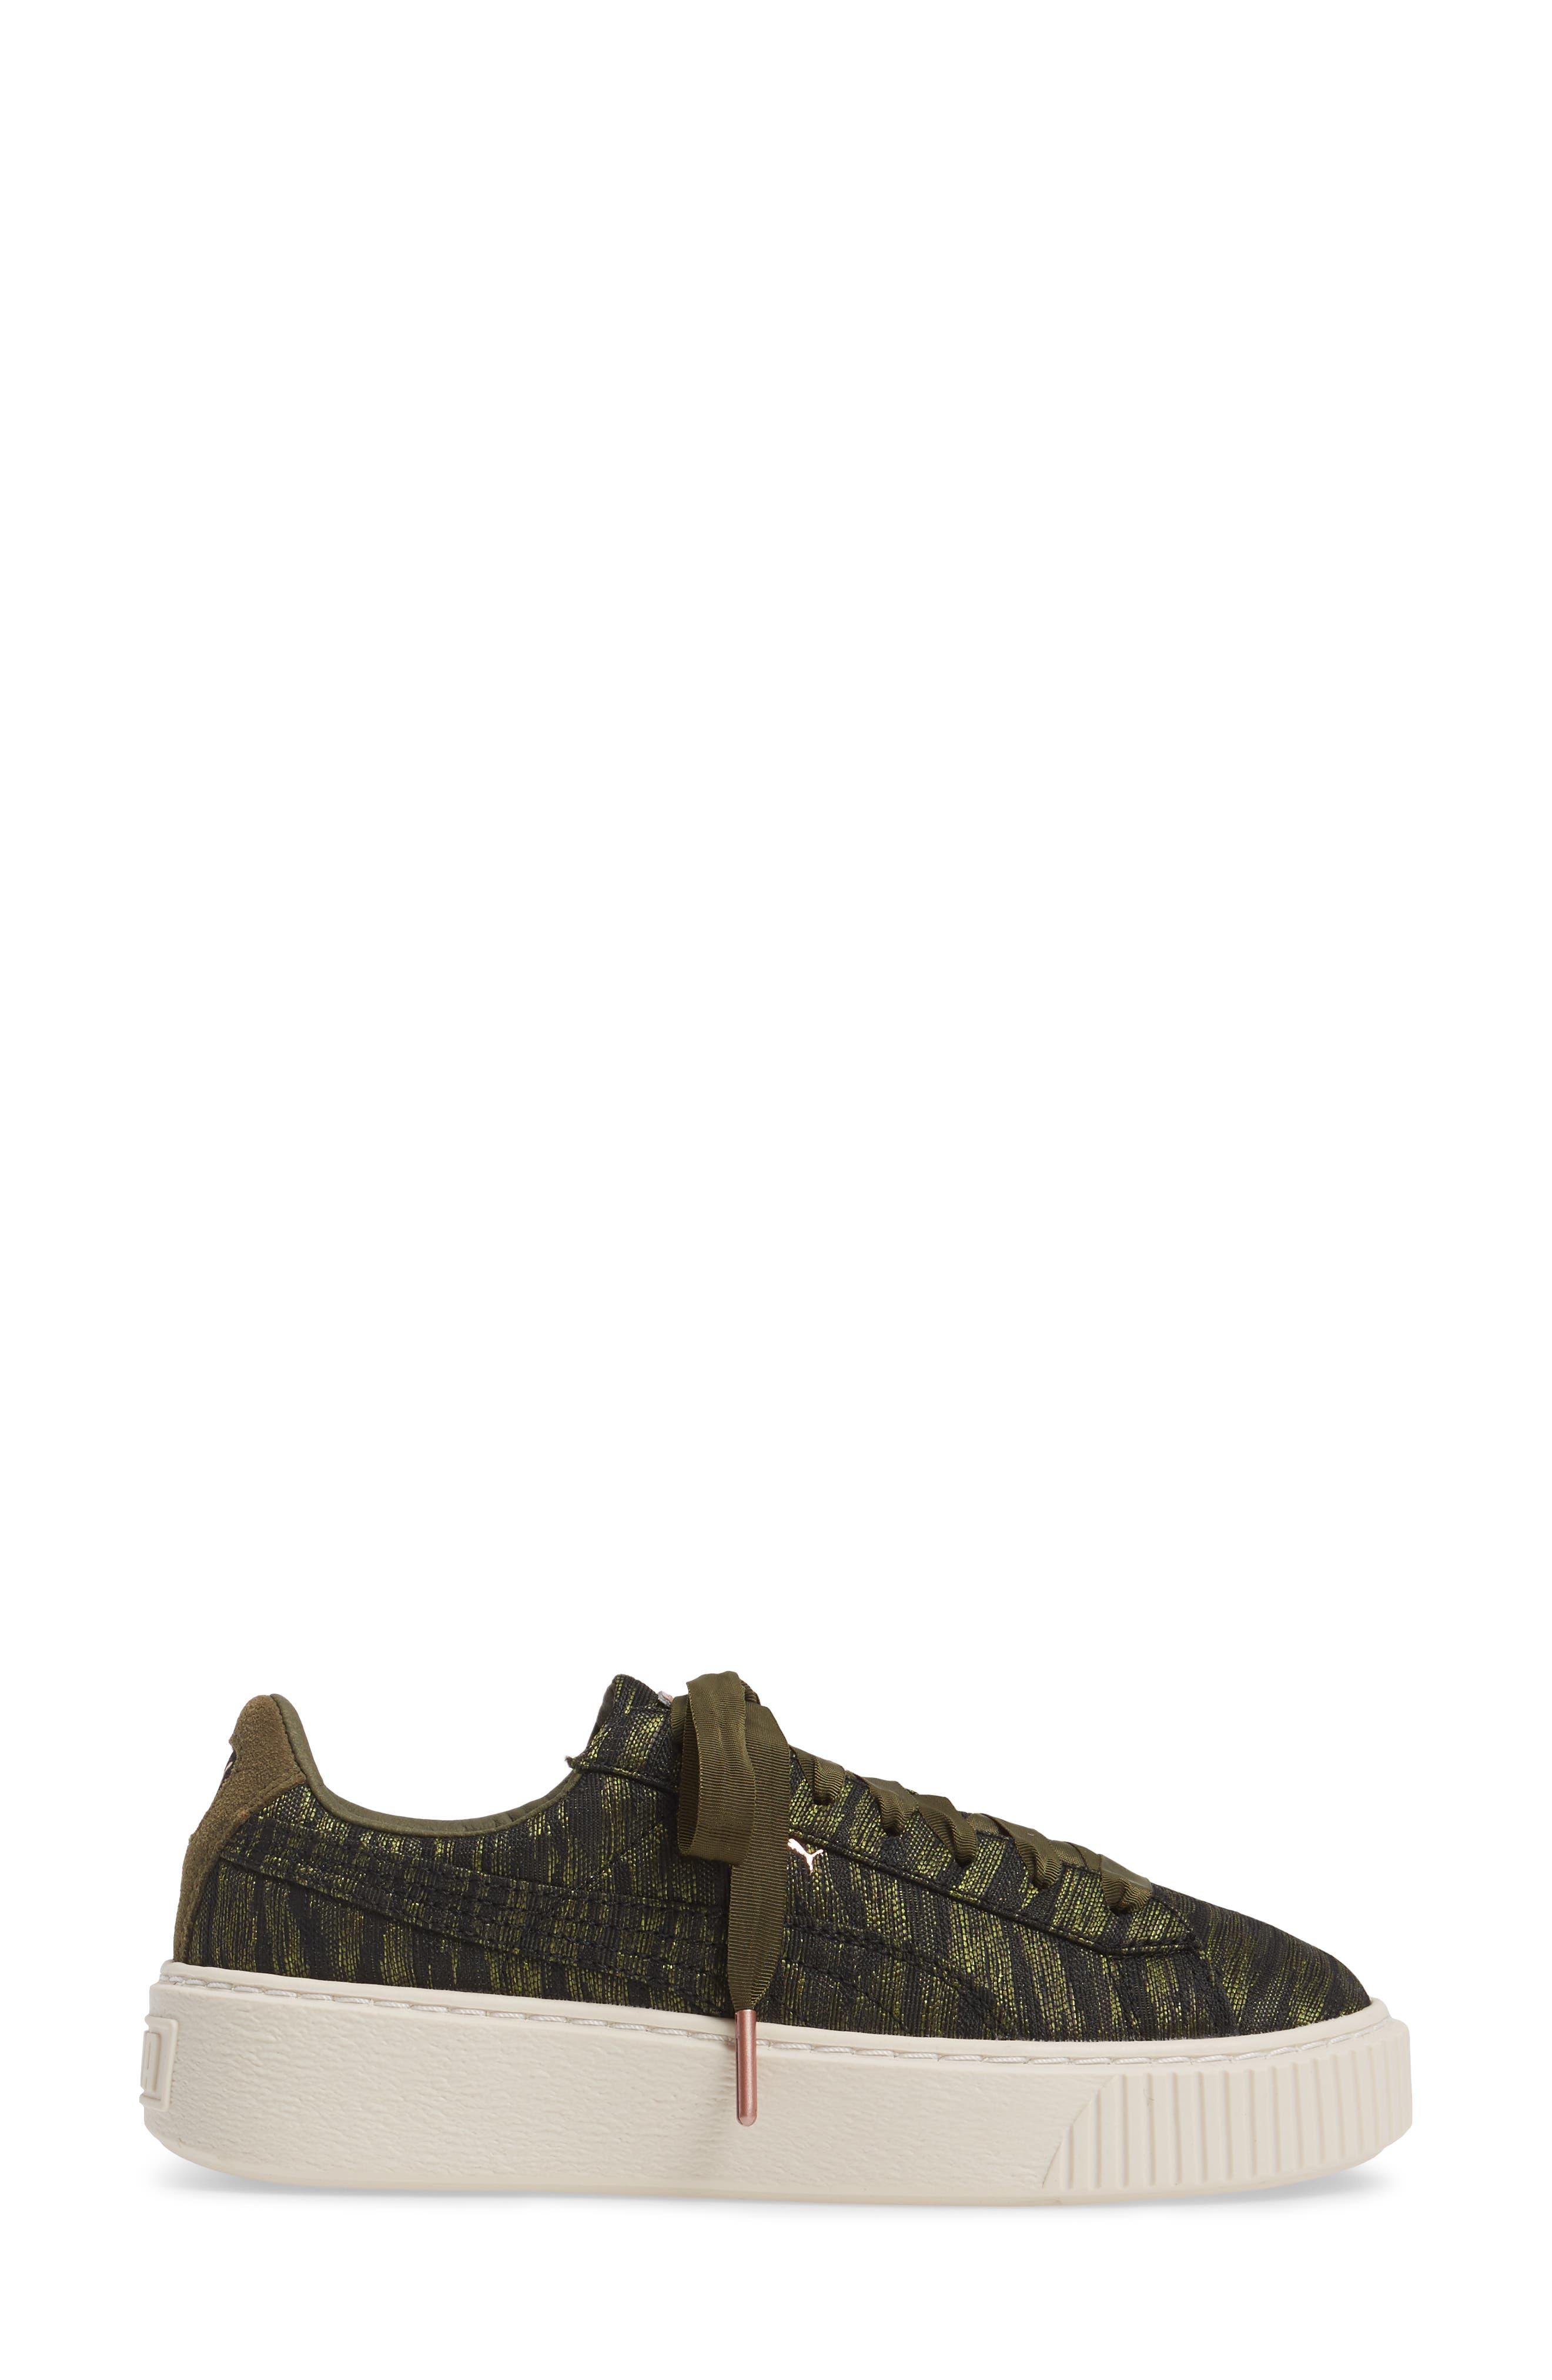 Alternate Image 3  - PUMA Basket Platform Sneaker (Women)